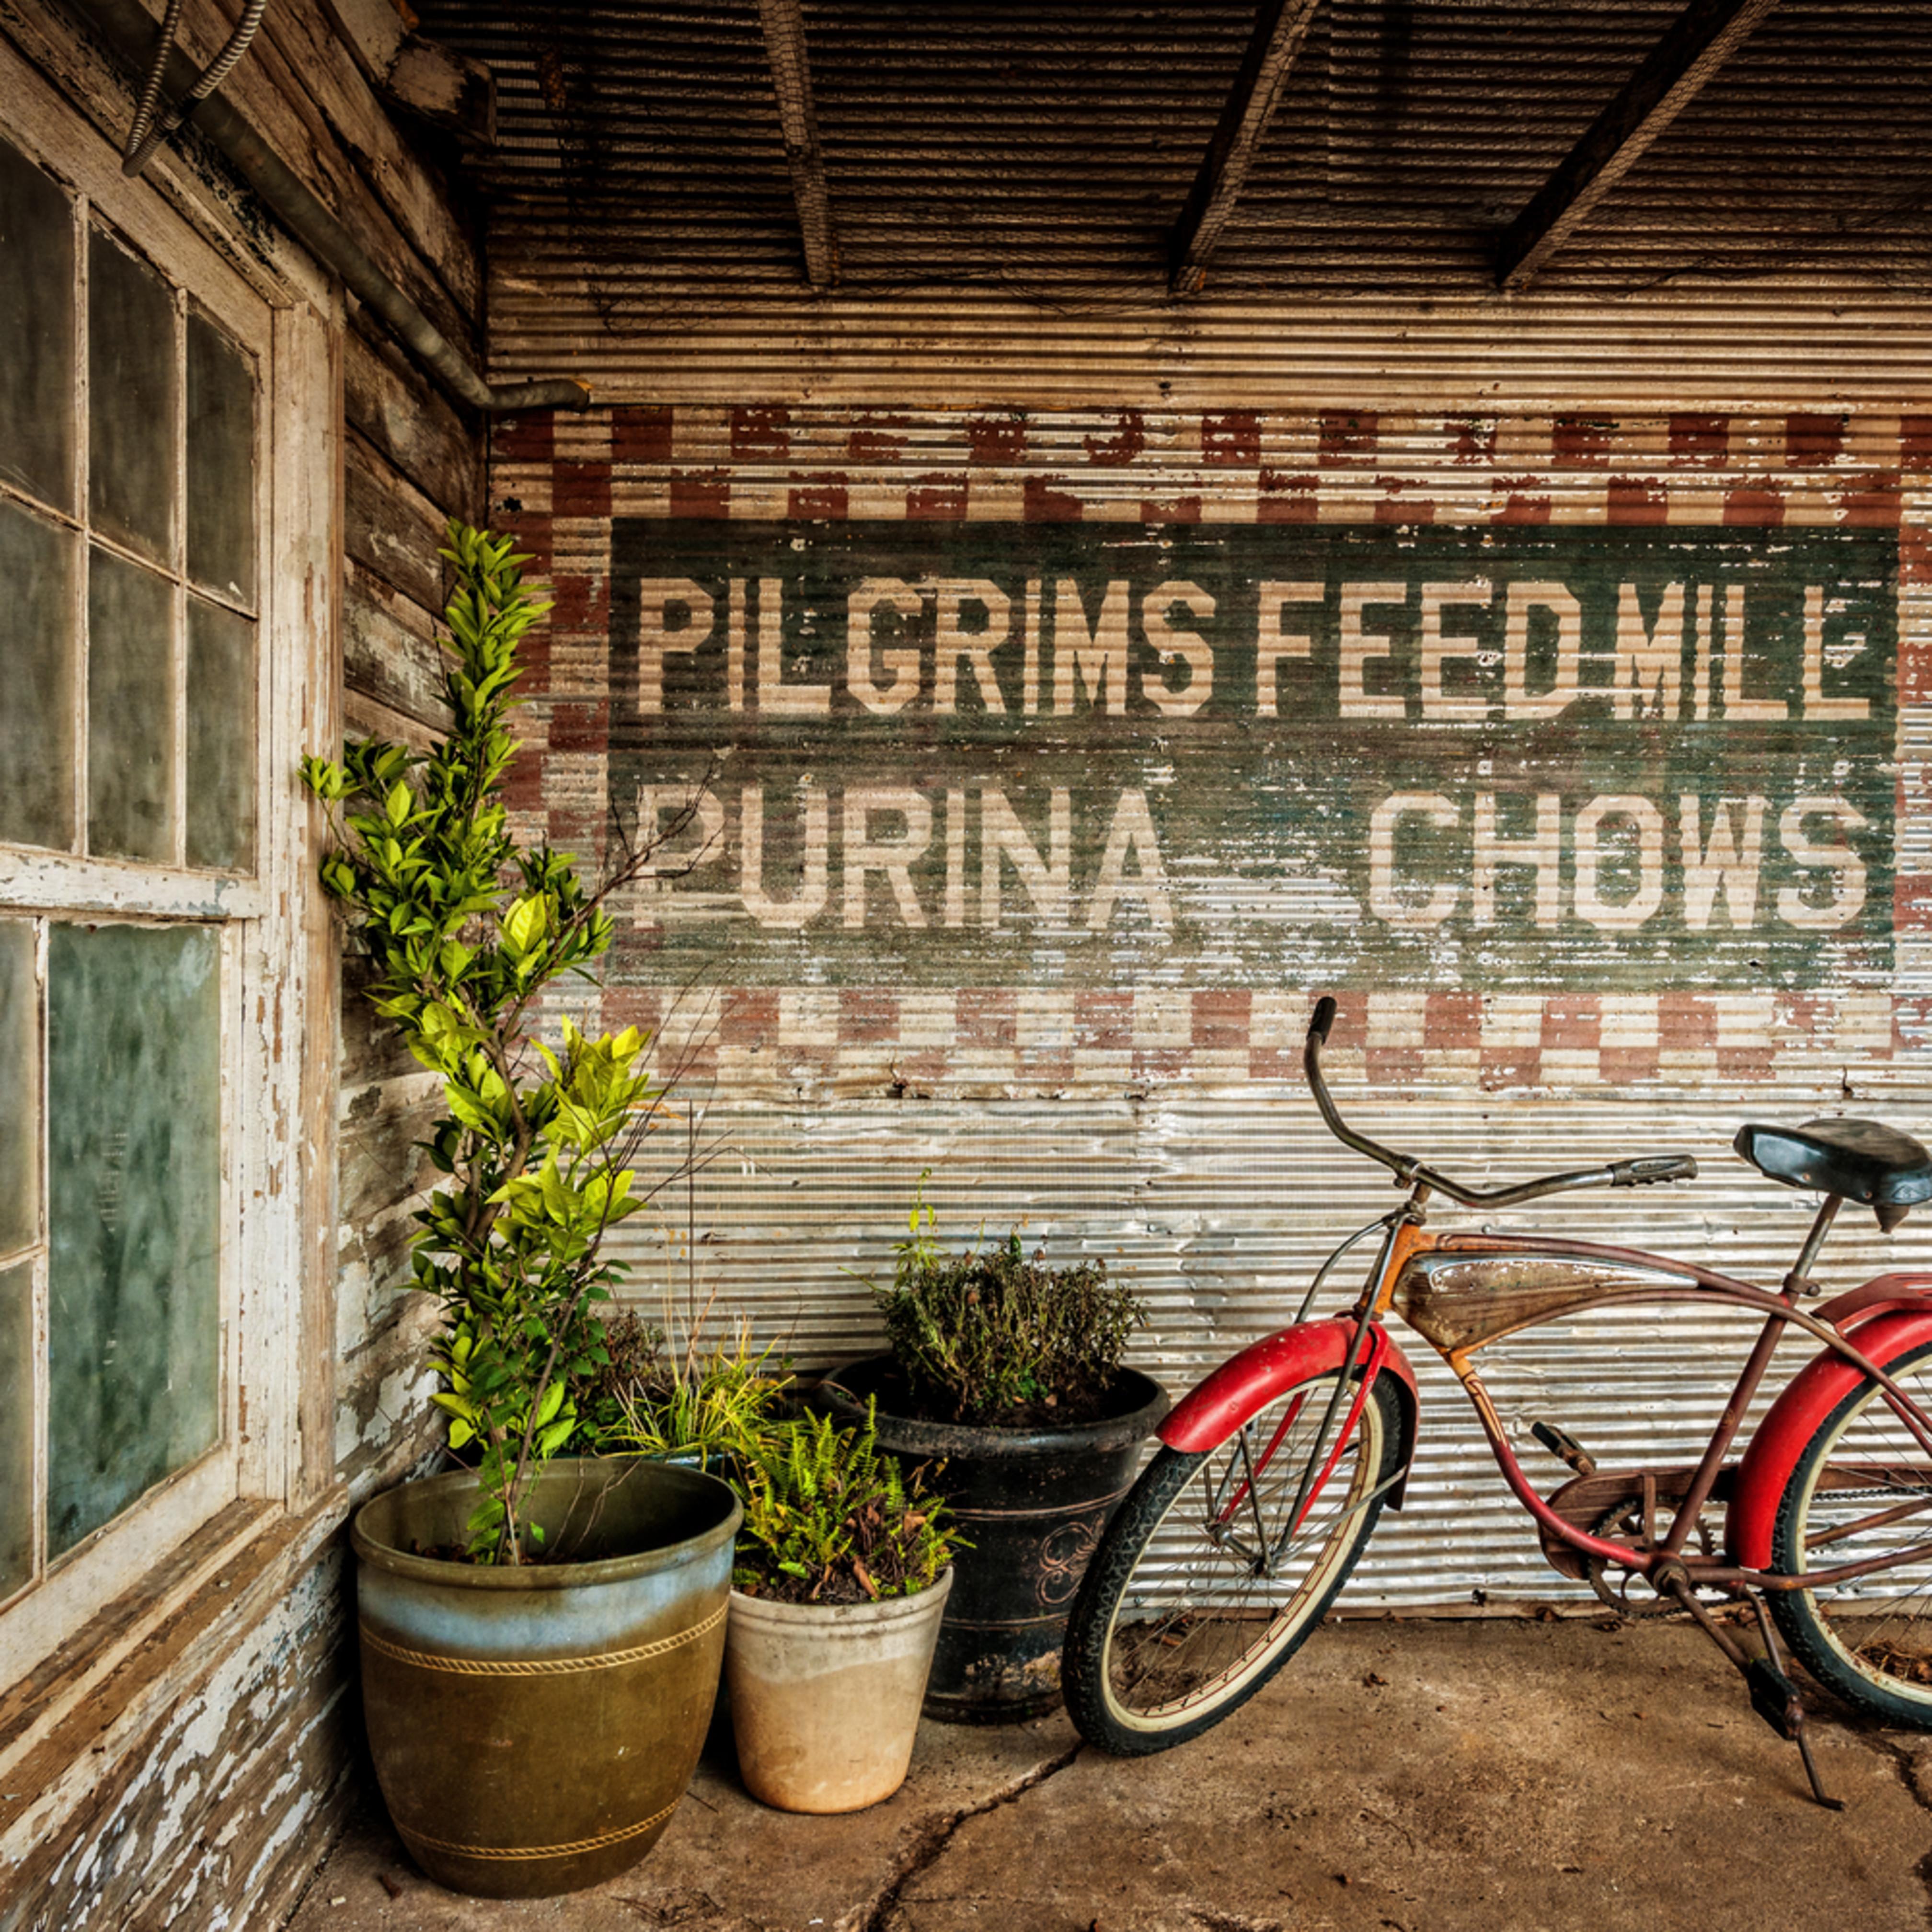 Pilgrims feed mill ahscga